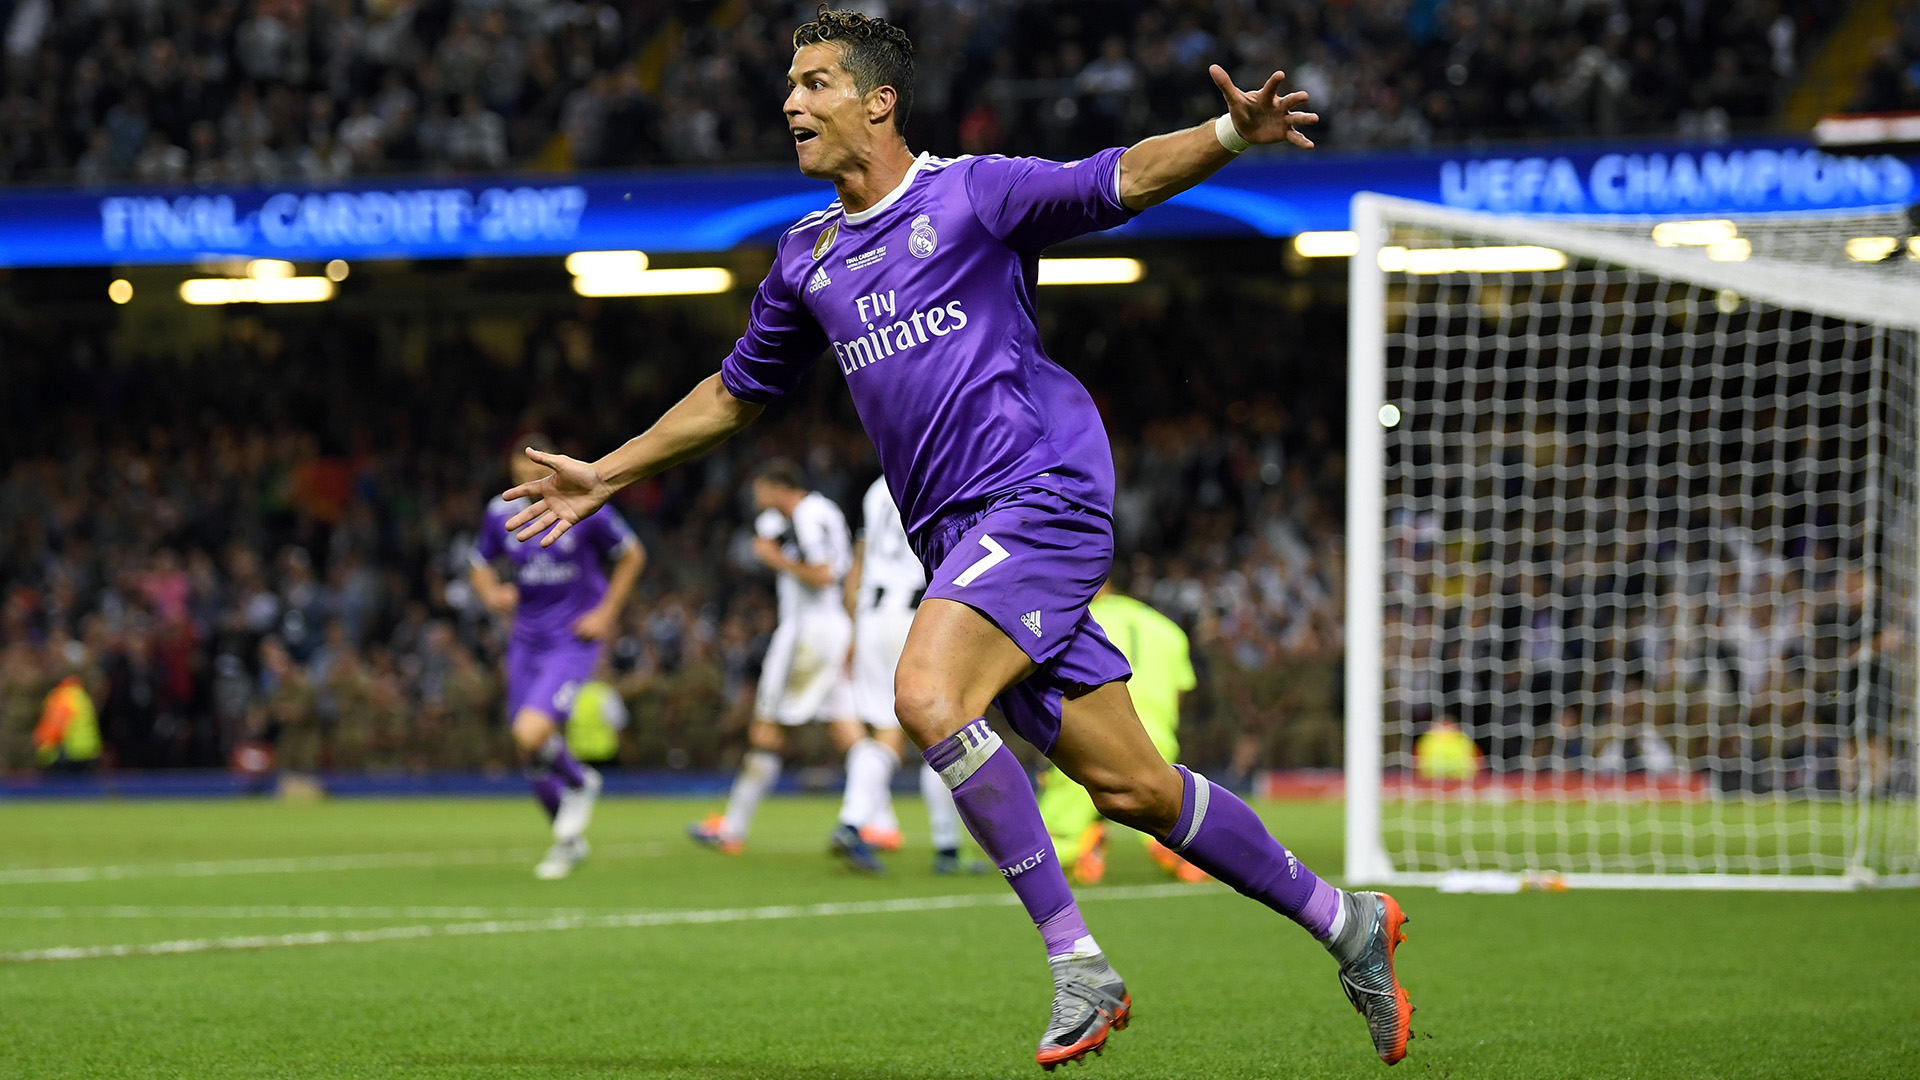 Real Madrid back Cristiano Ronaldo in tax fraud row